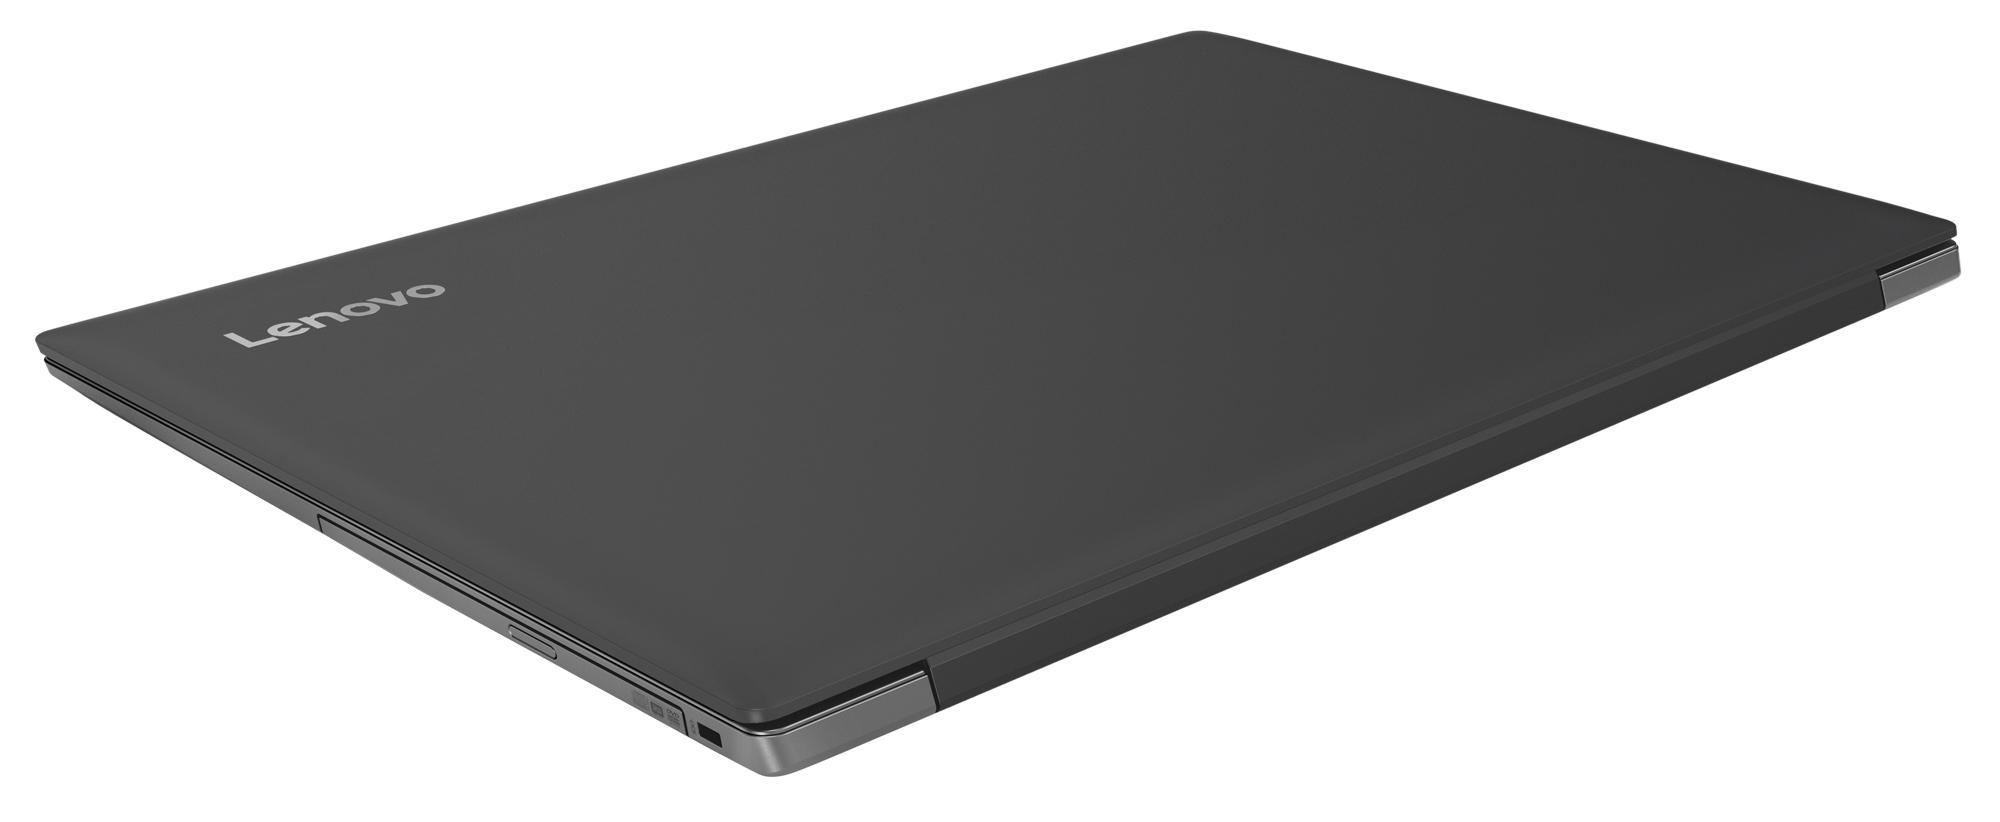 Фото  Ноутбук Lenovo ideapad 330-17IKB Onyx Black (81DK006FRA)